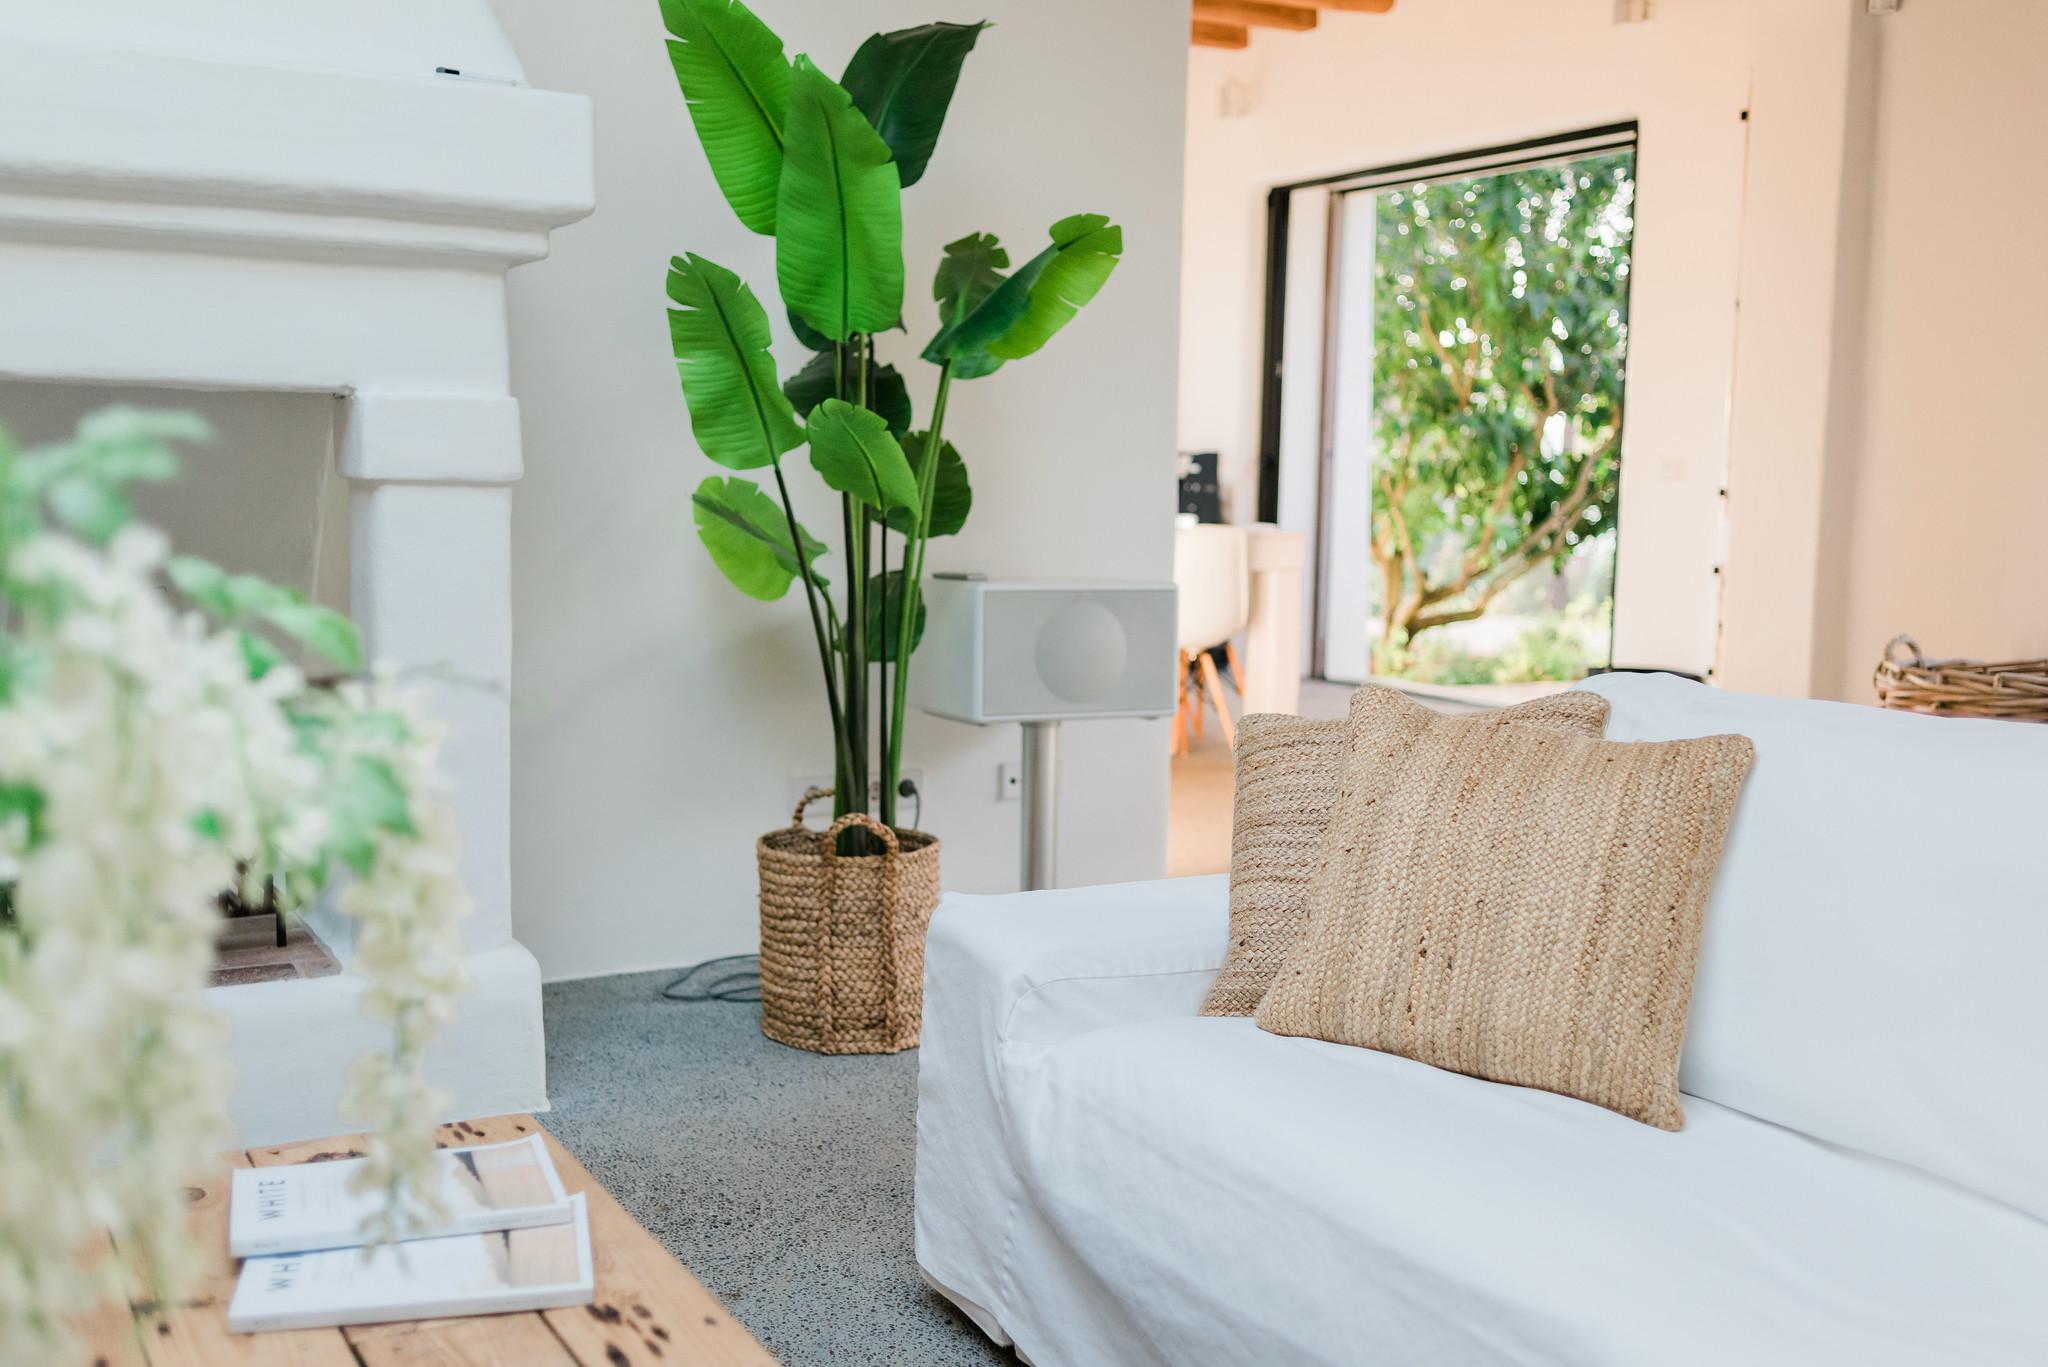 https://www.white-ibiza.com/wp-content/uploads/2020/05/white-ibiza-villas-can-terra-living-room1.jpg